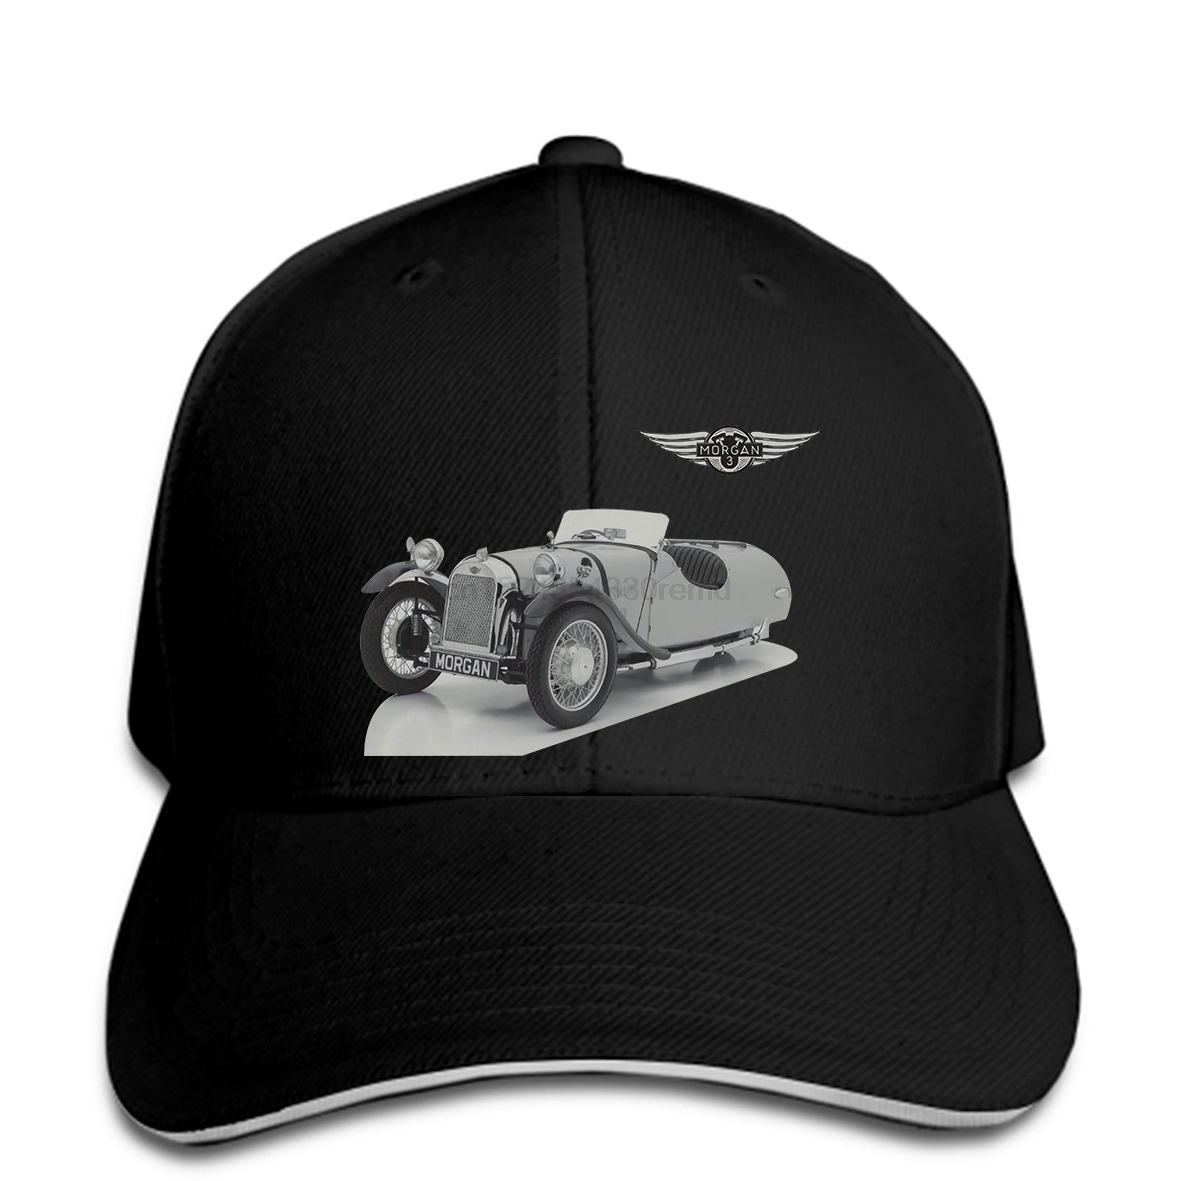 Classic Vintage Morgan 3 Wheeler Car Fine Detail Illustration T-Shirt S to 5XL